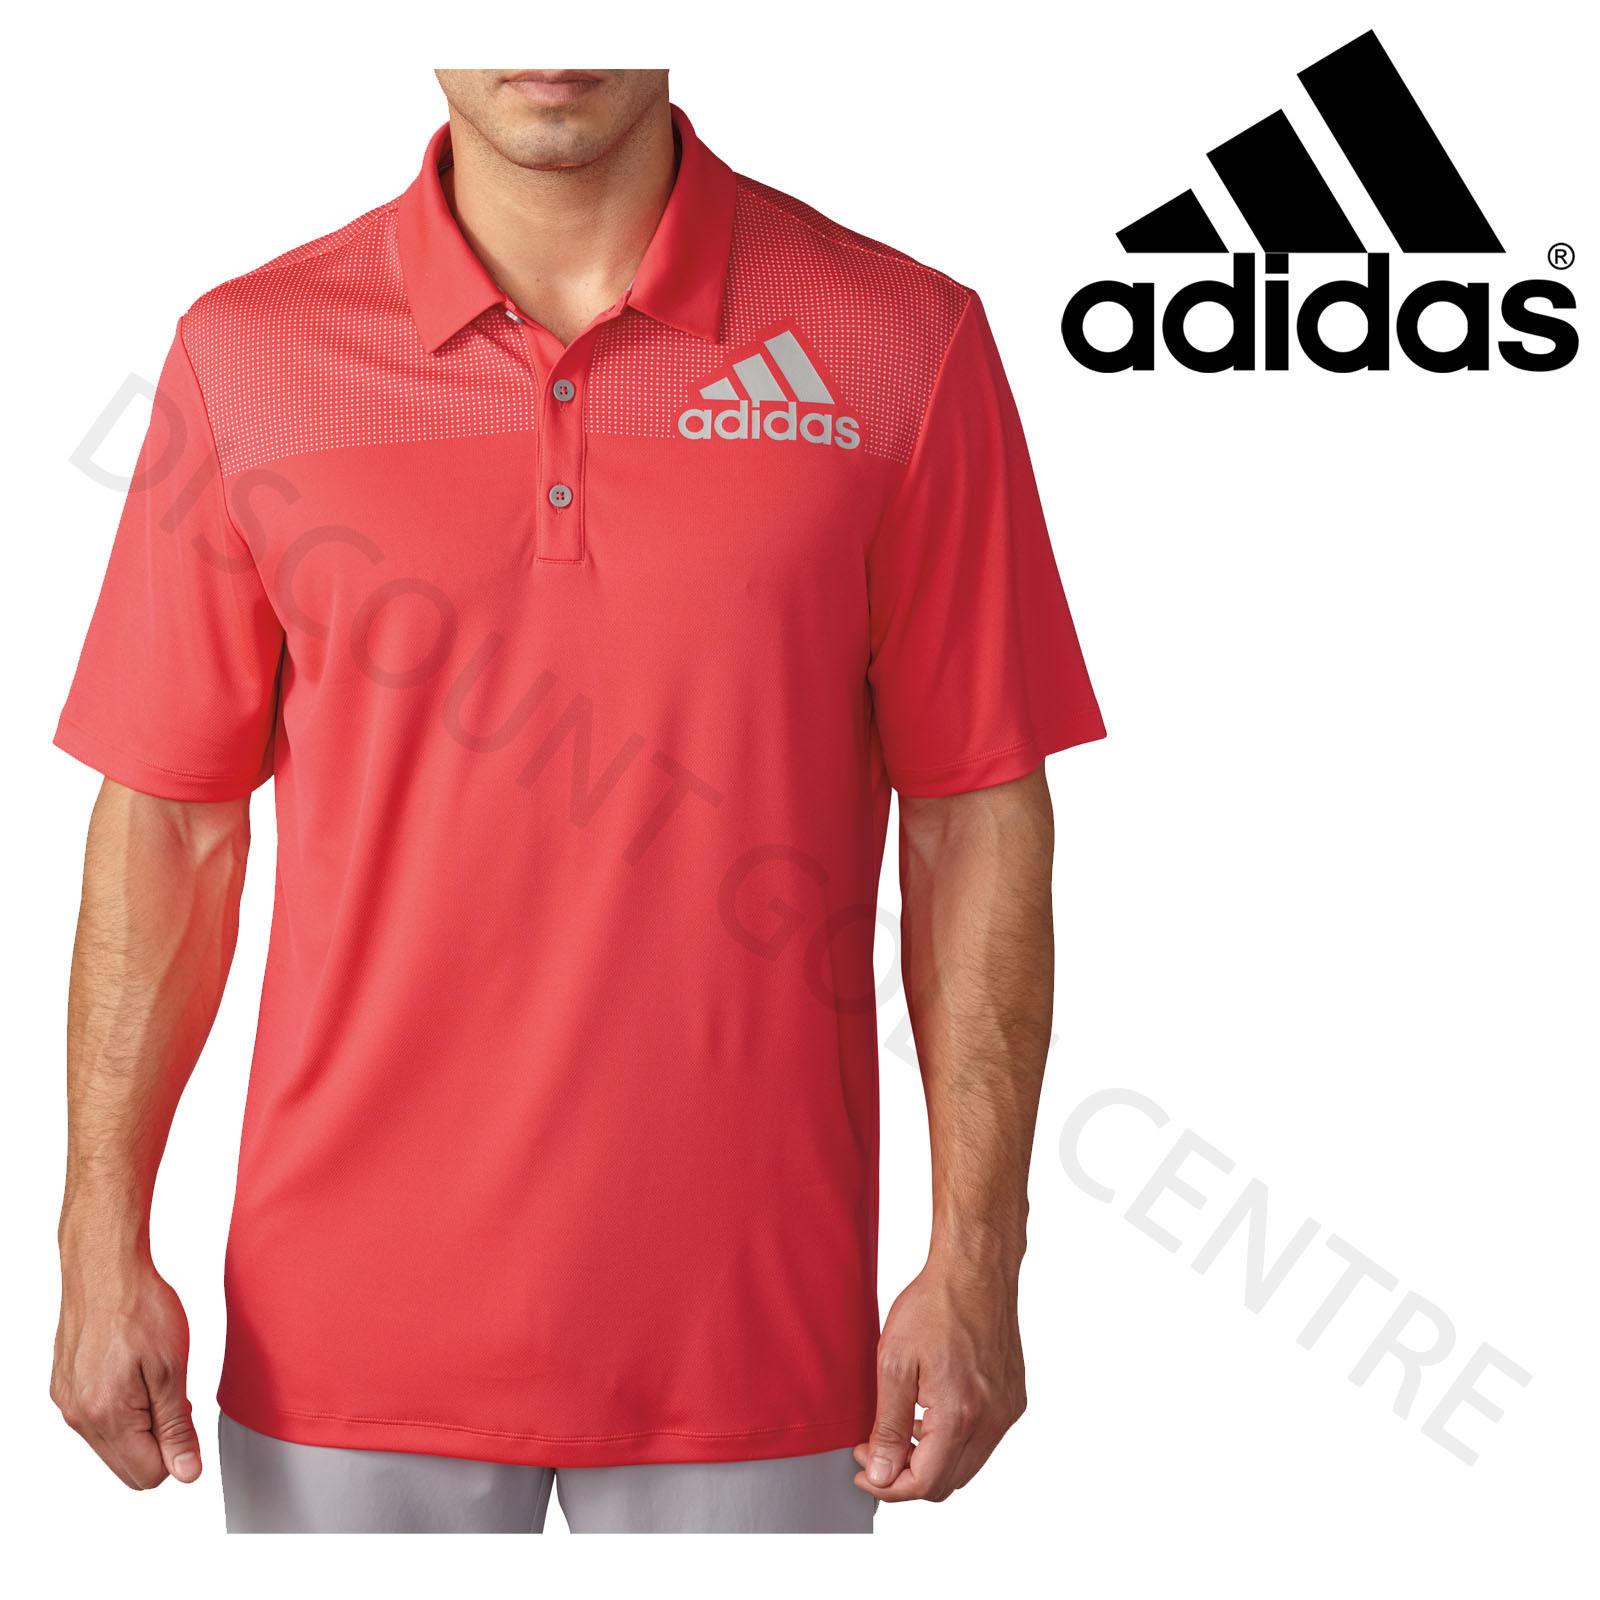 Adidas 2016 Big Logo Dot Print Lightweight Mens Golf Polo Shirt Shock Red/Stone Small f4YYuSTSu